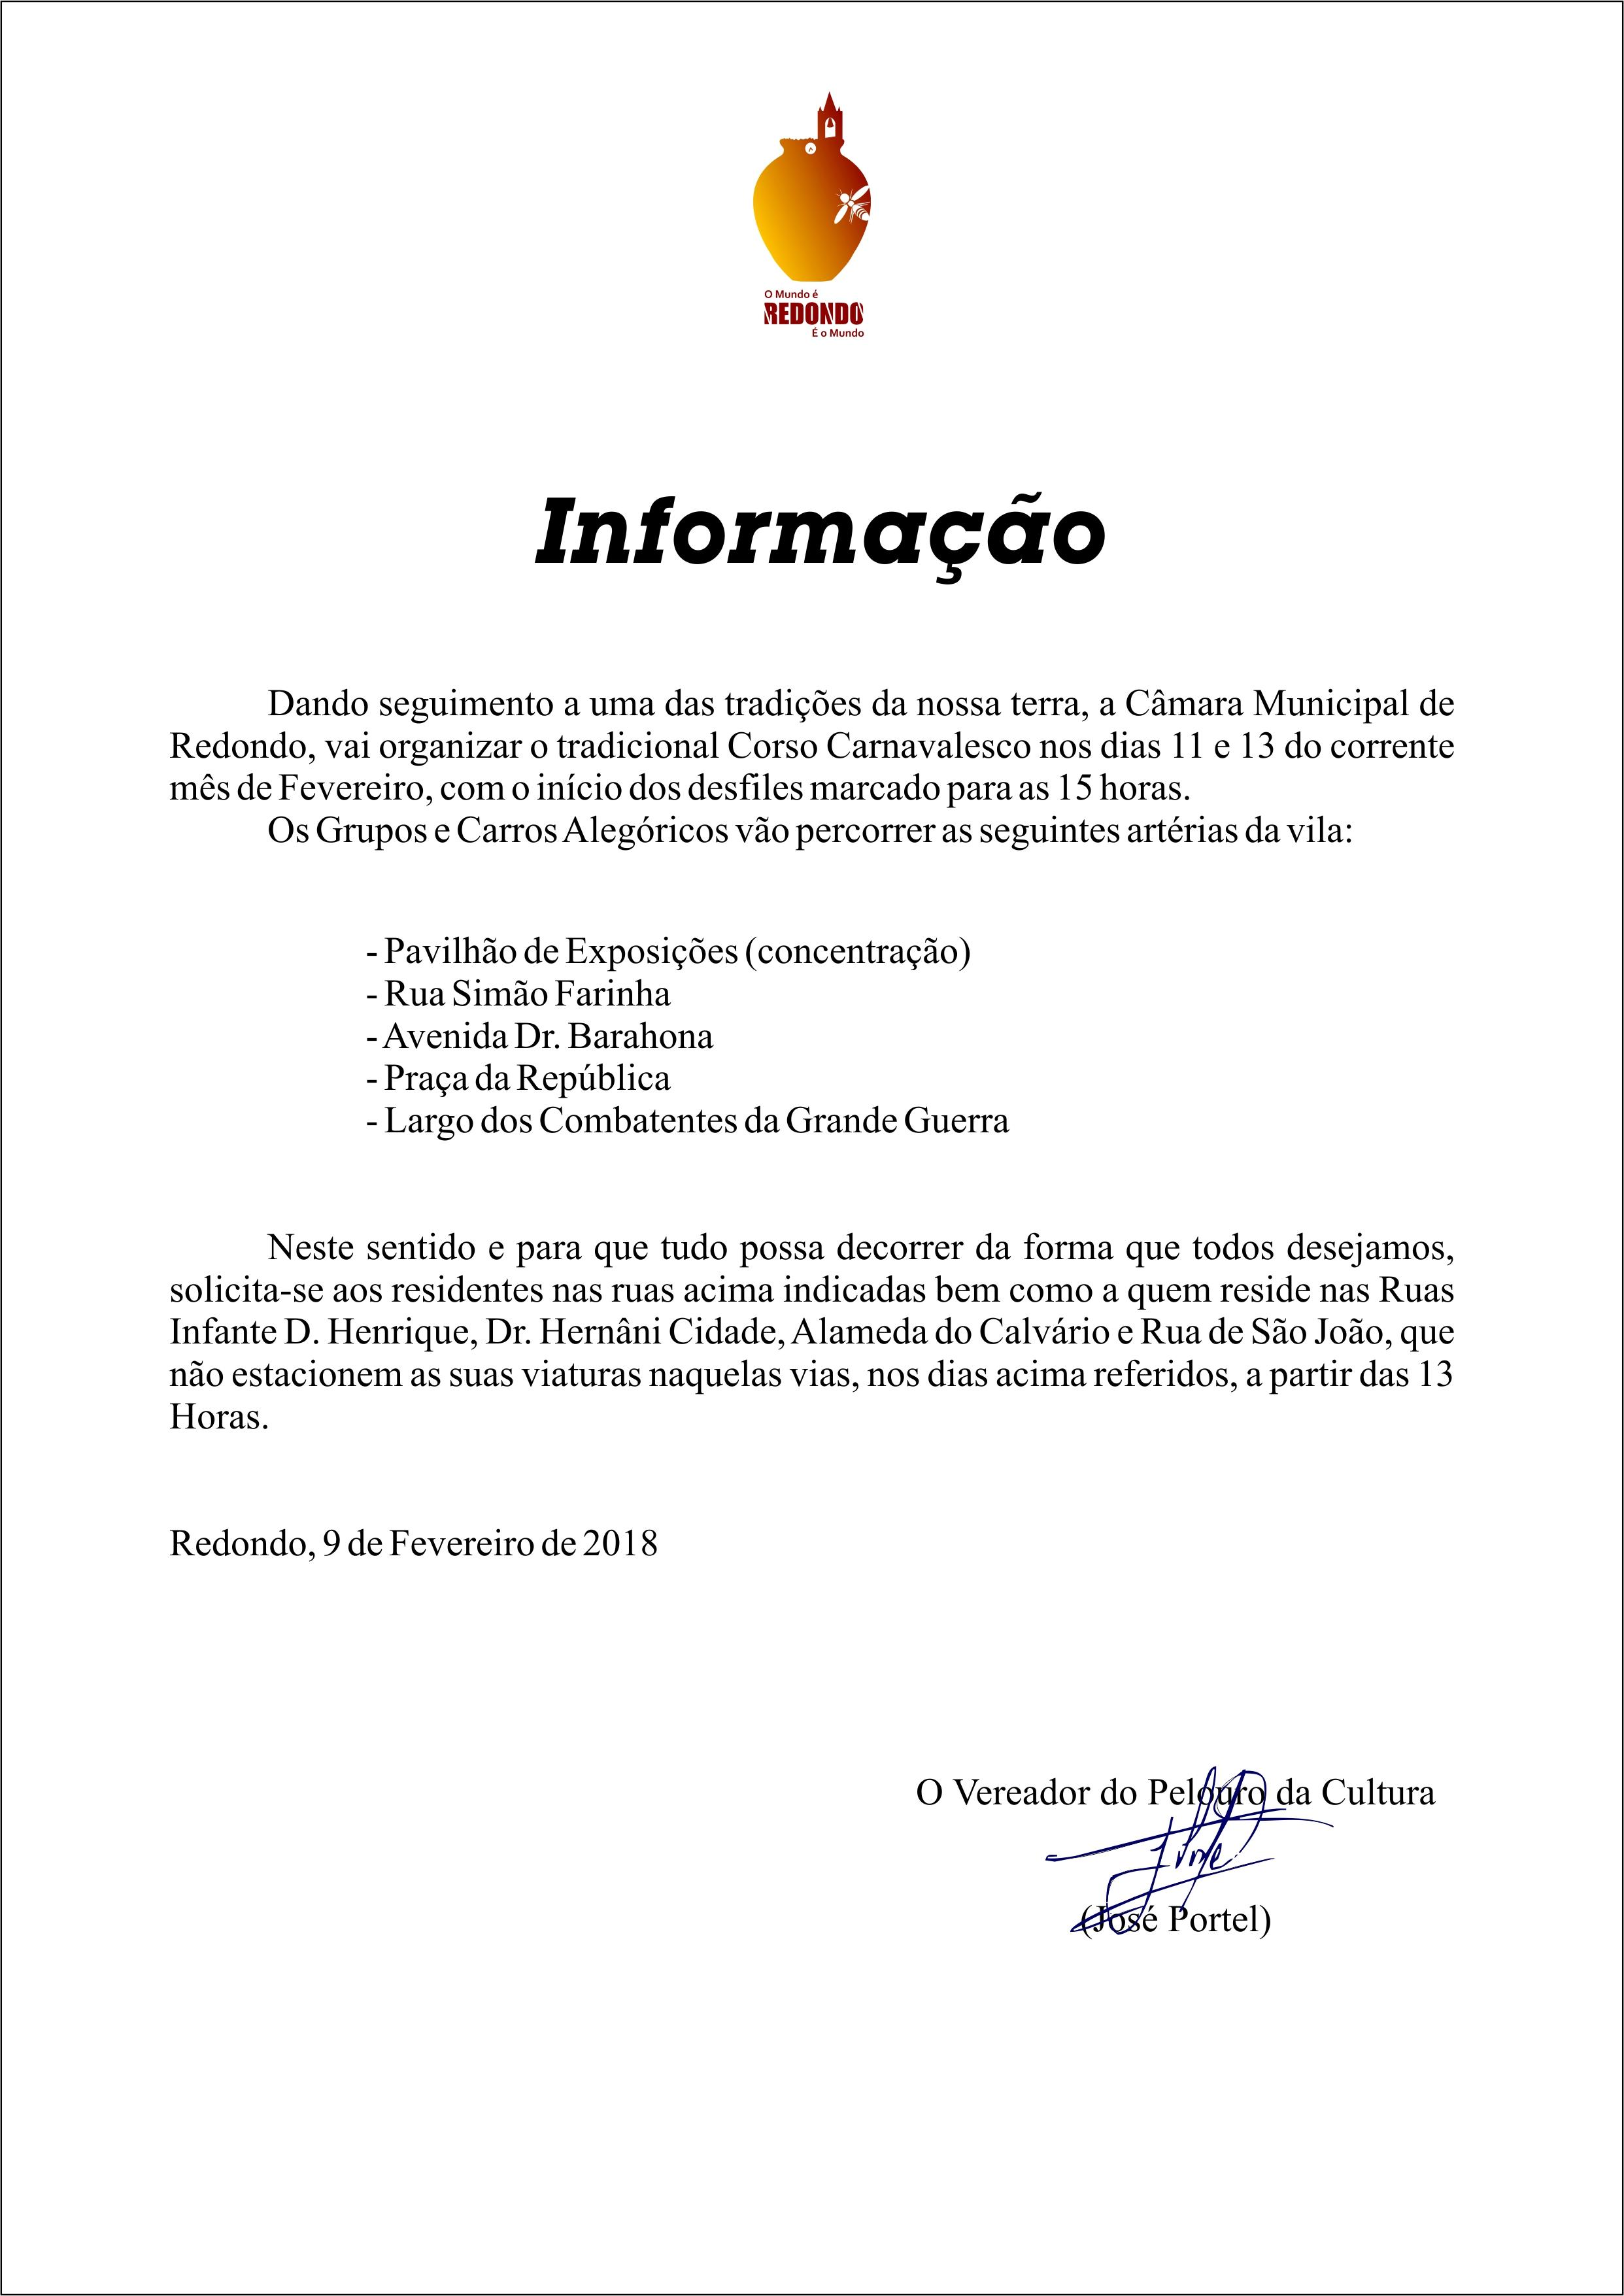 Info carnaval 18.jpg